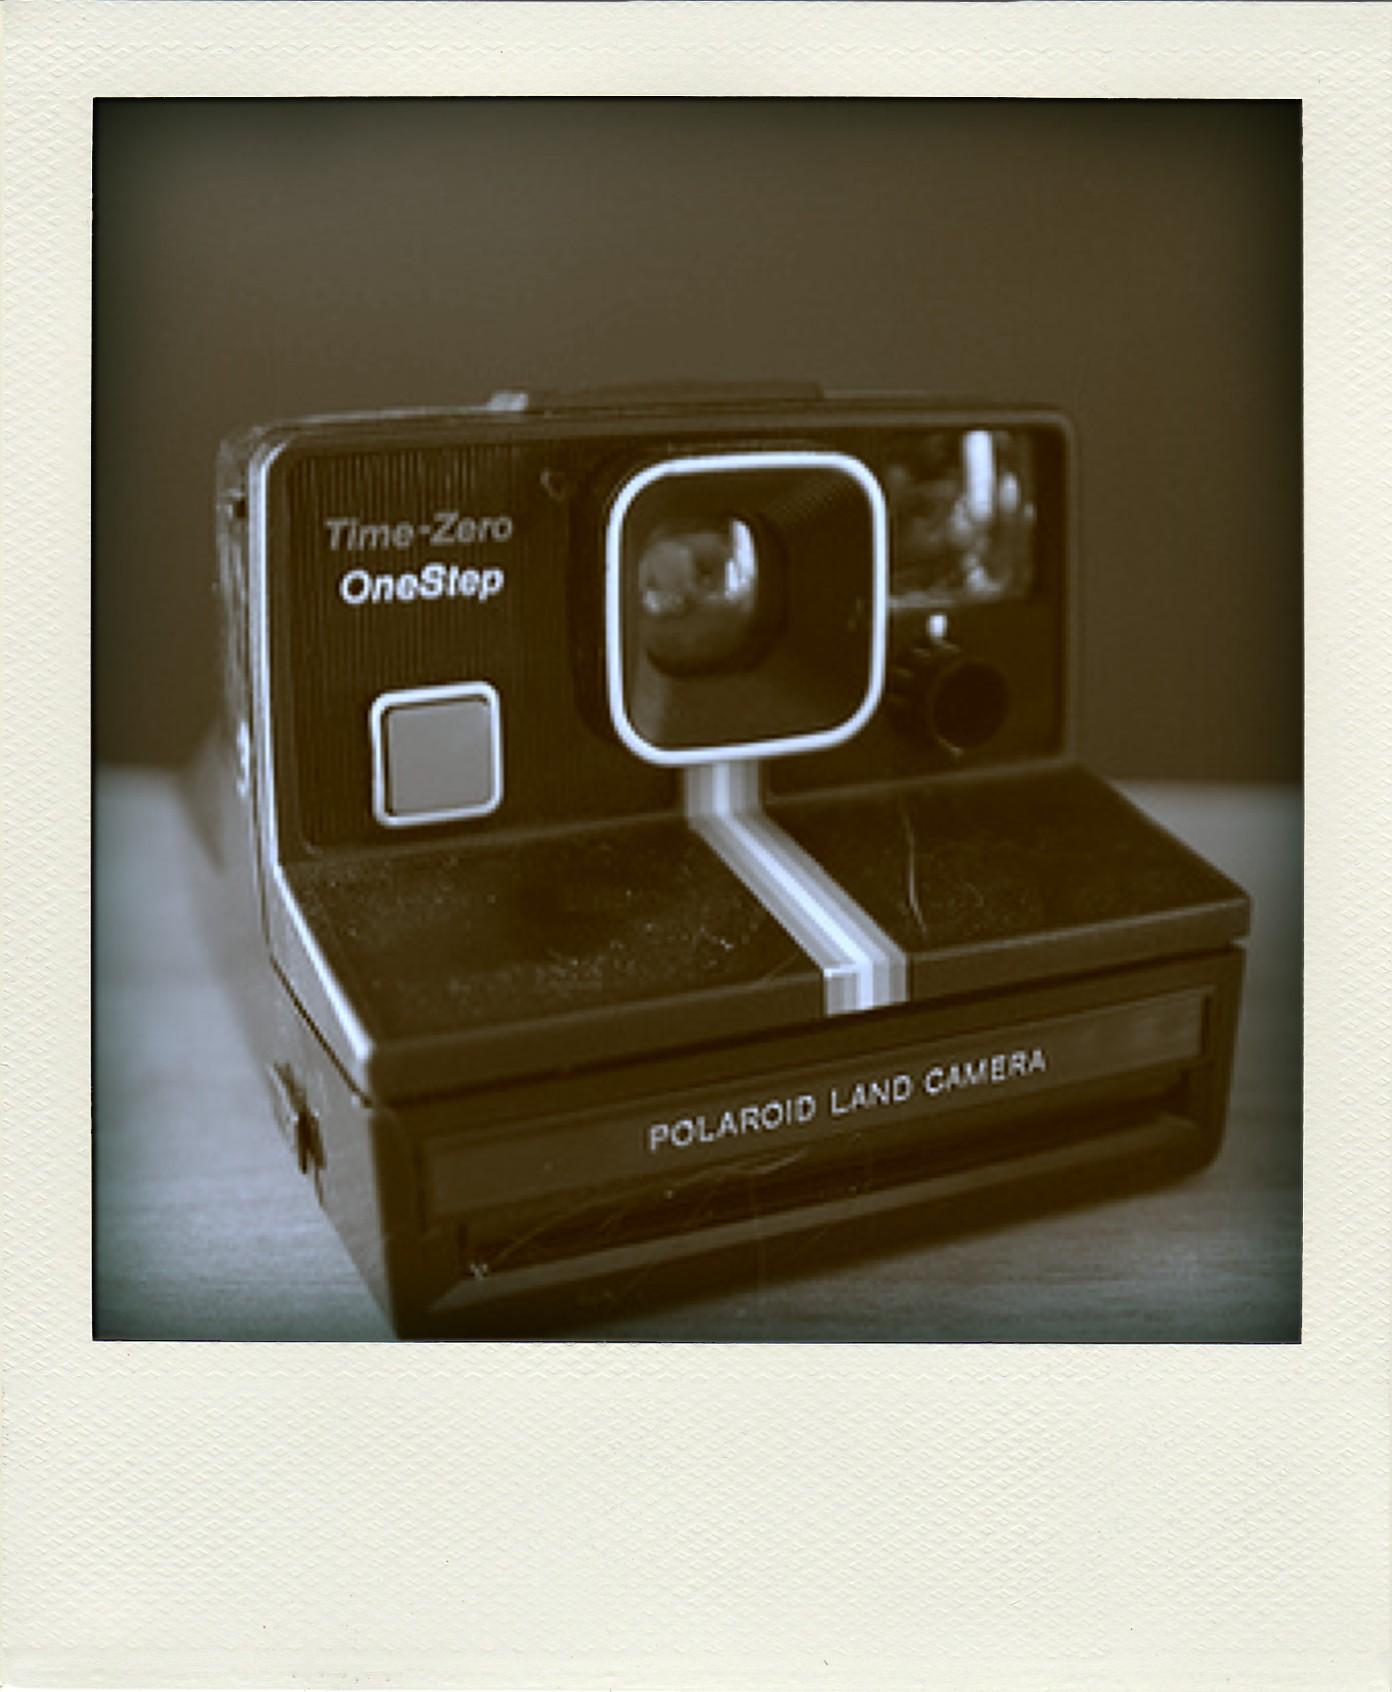 polaroidcamera-thumb-pola